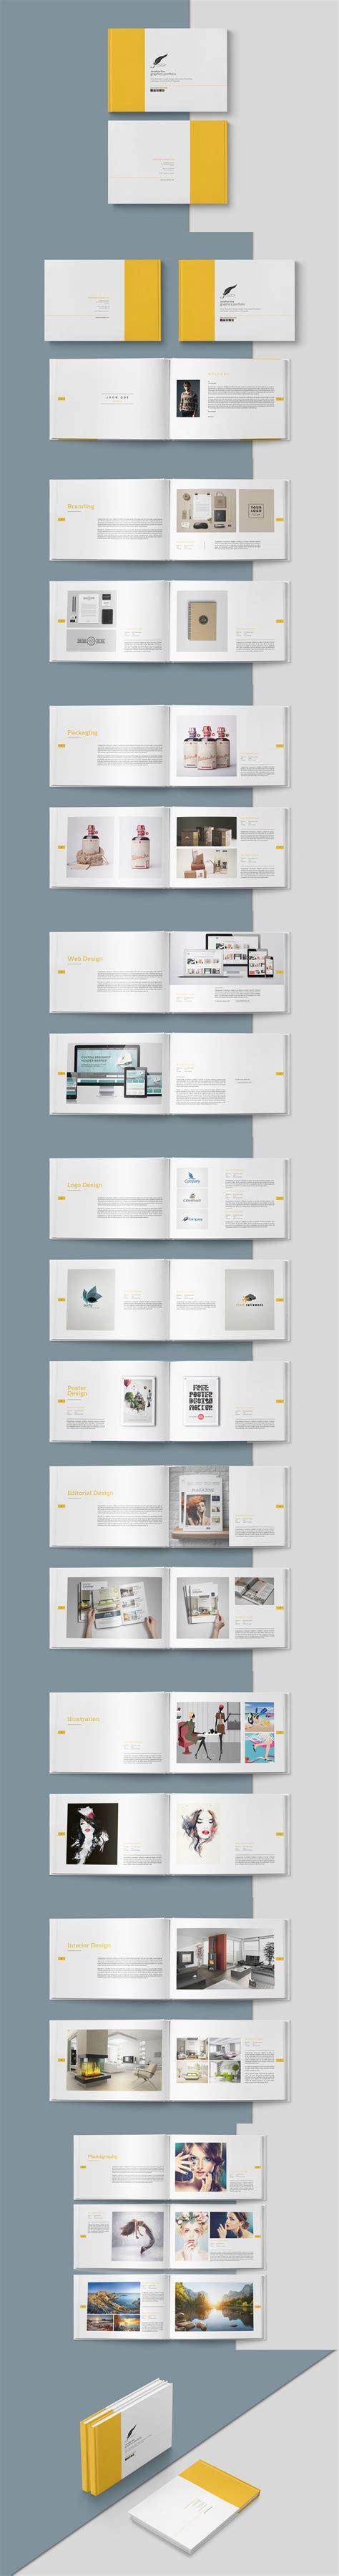 Portfolio Brochure Template 25 Best Ideas About Brochure Cover On